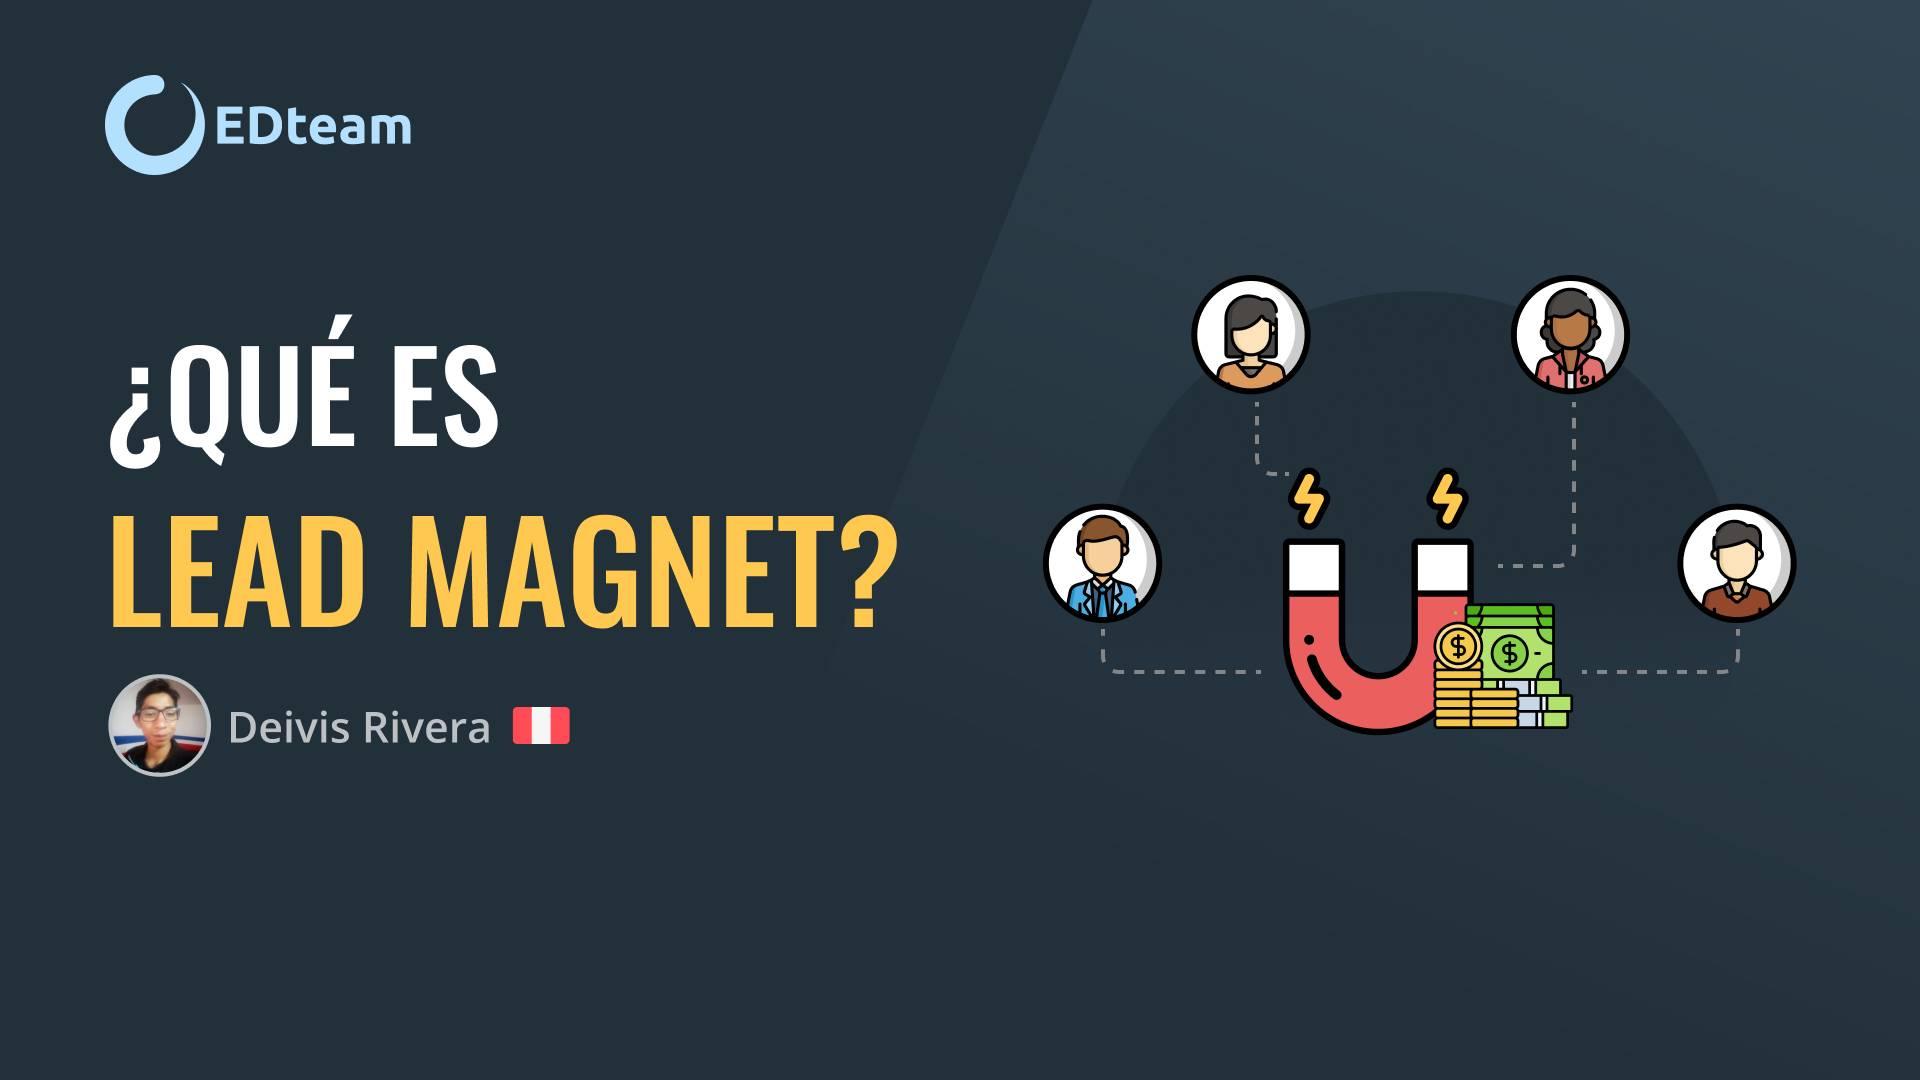 ¿Quieres aumentar tu base de datos de clientes? ¡Haz lead magnets!